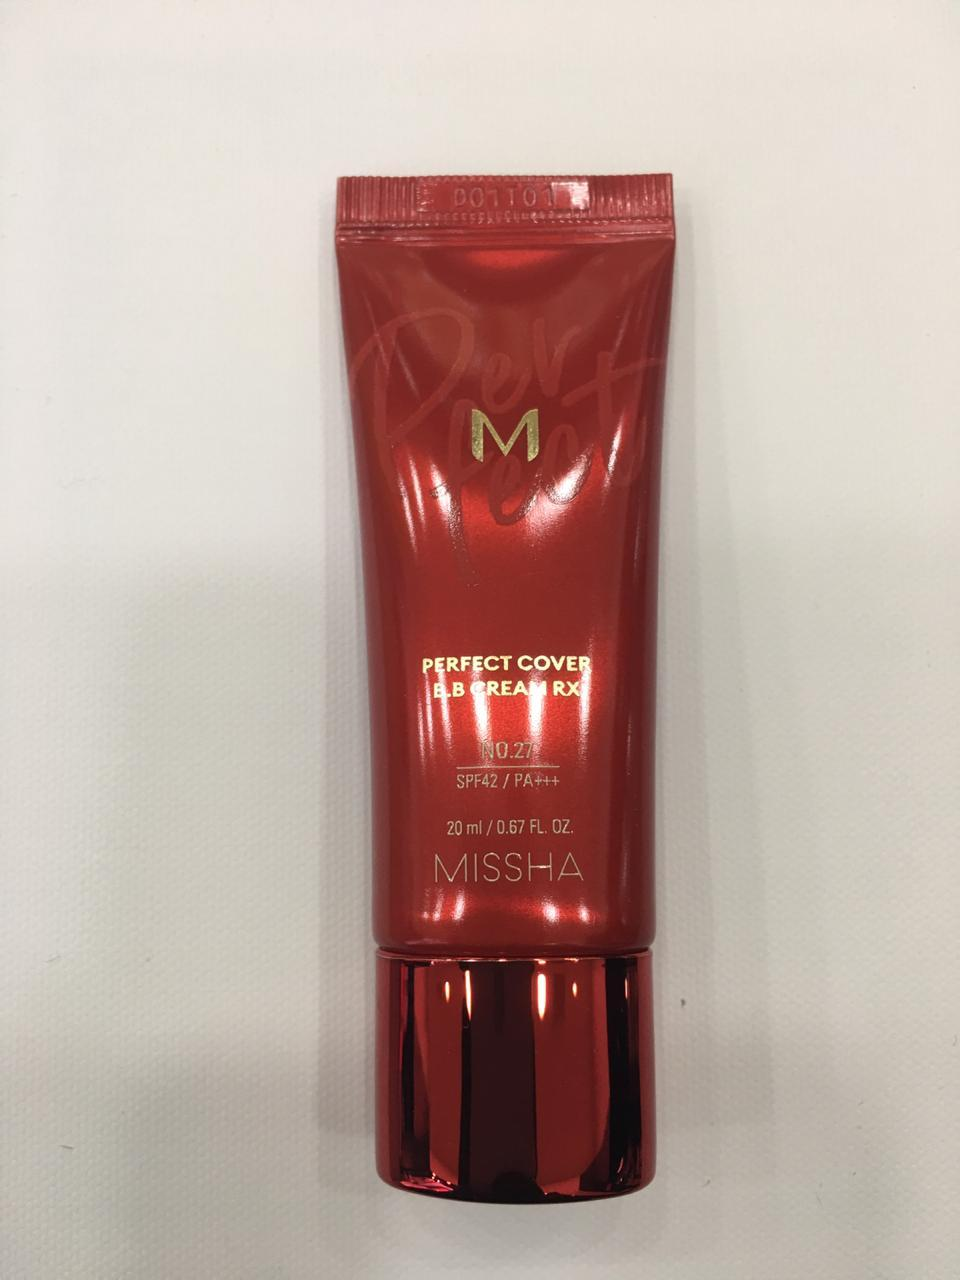 ВВ крем M Perfect Cover BB Cream RX (NO.23/NATURAL BEIGE)